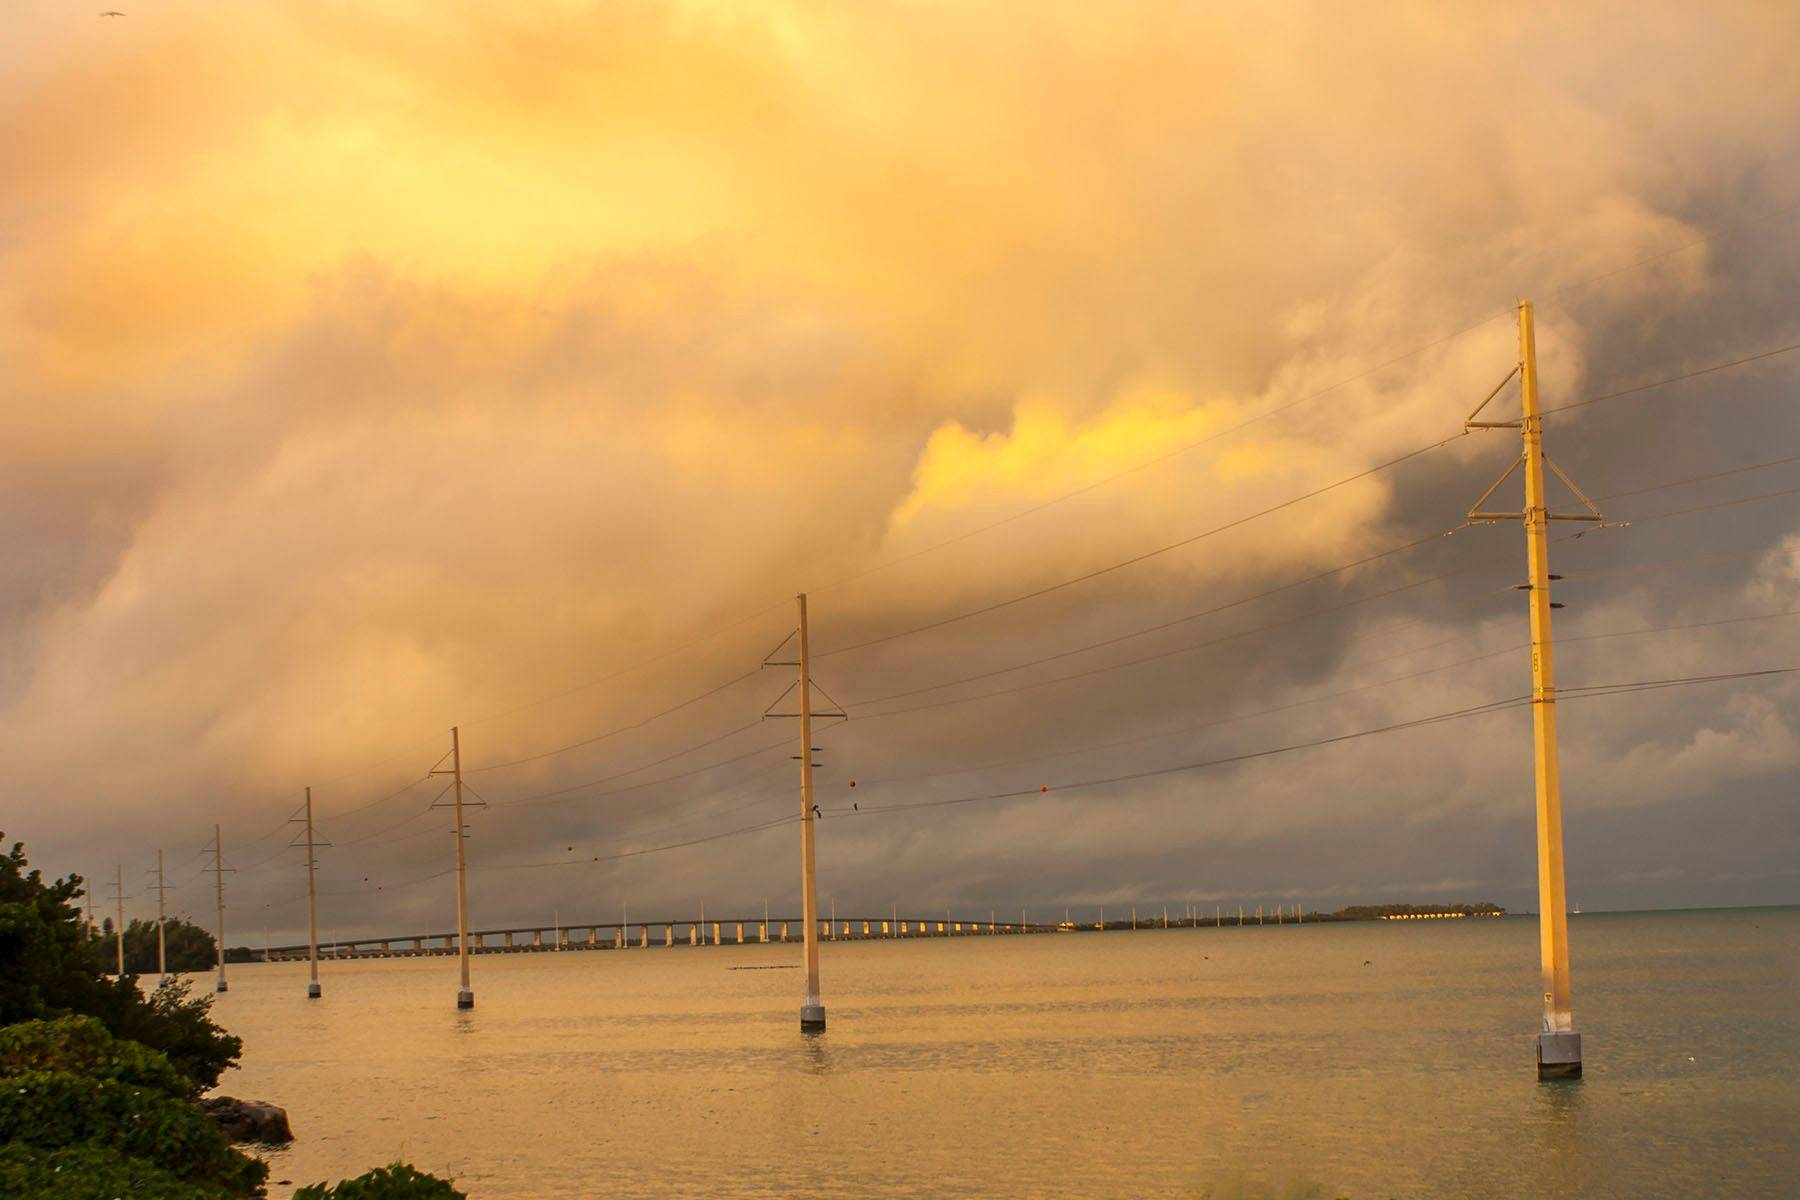 Transmission lines in florida keys duing sunrise, sea bridge